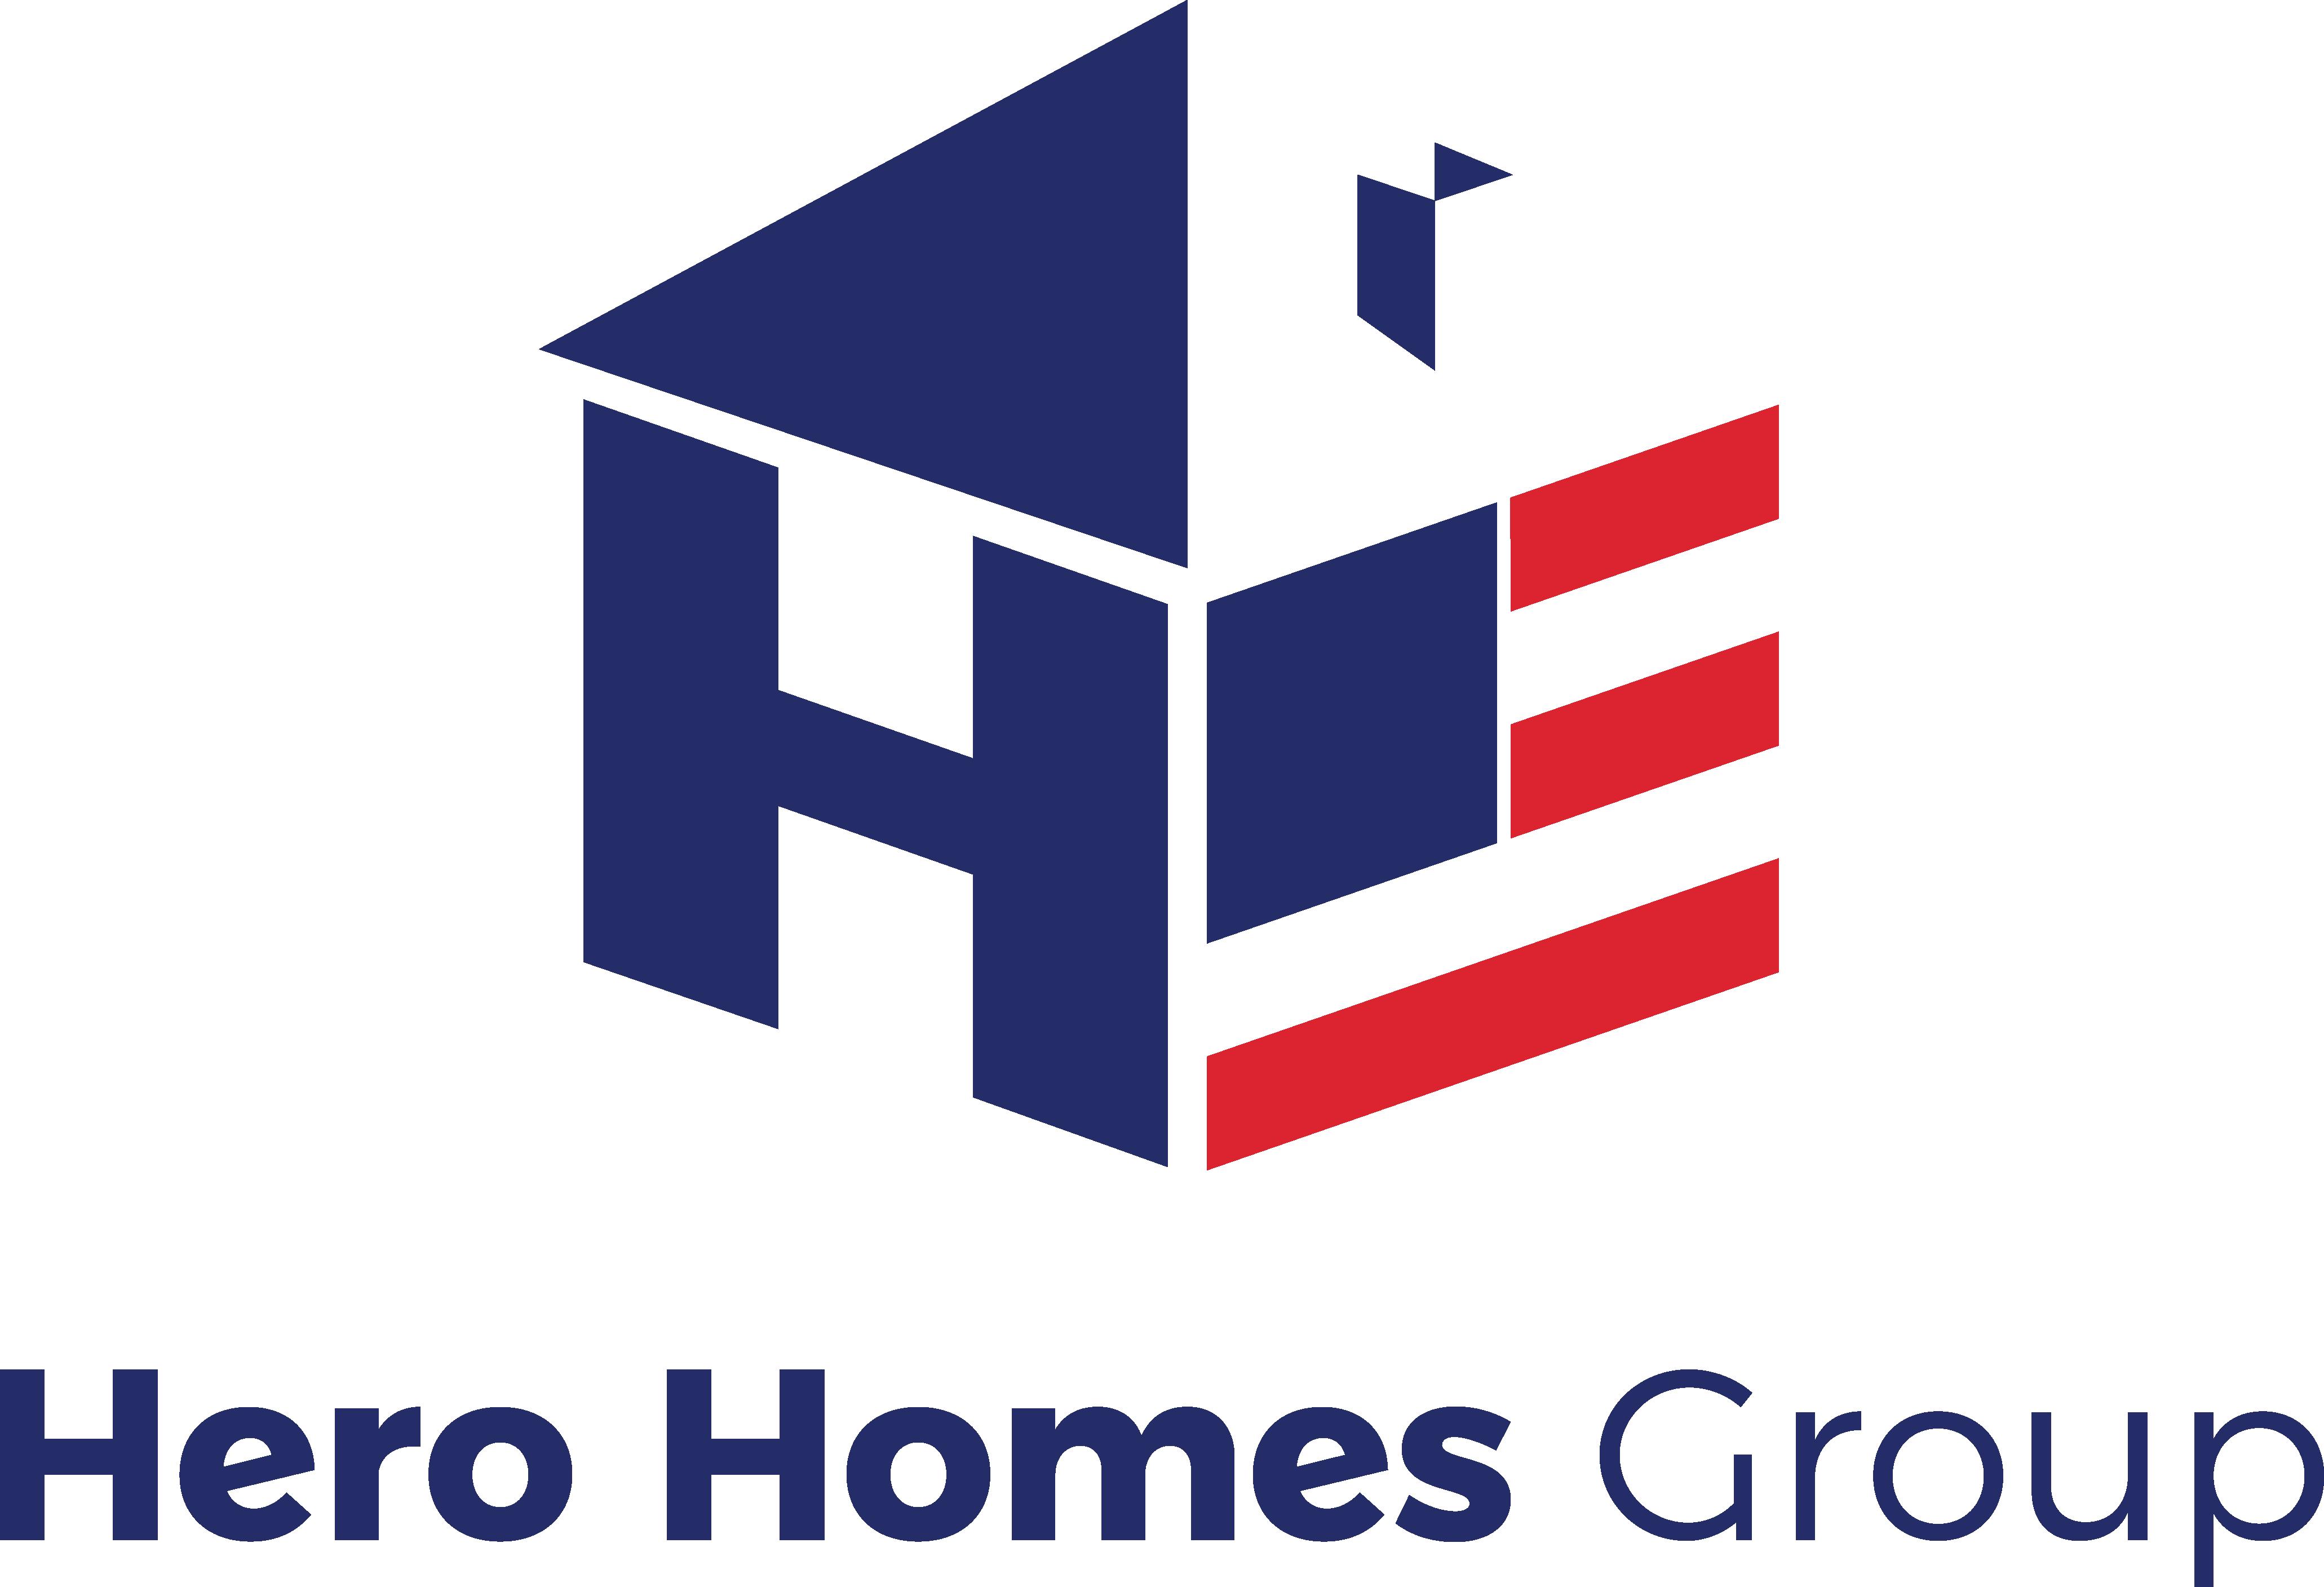 Hero Homes Group logo